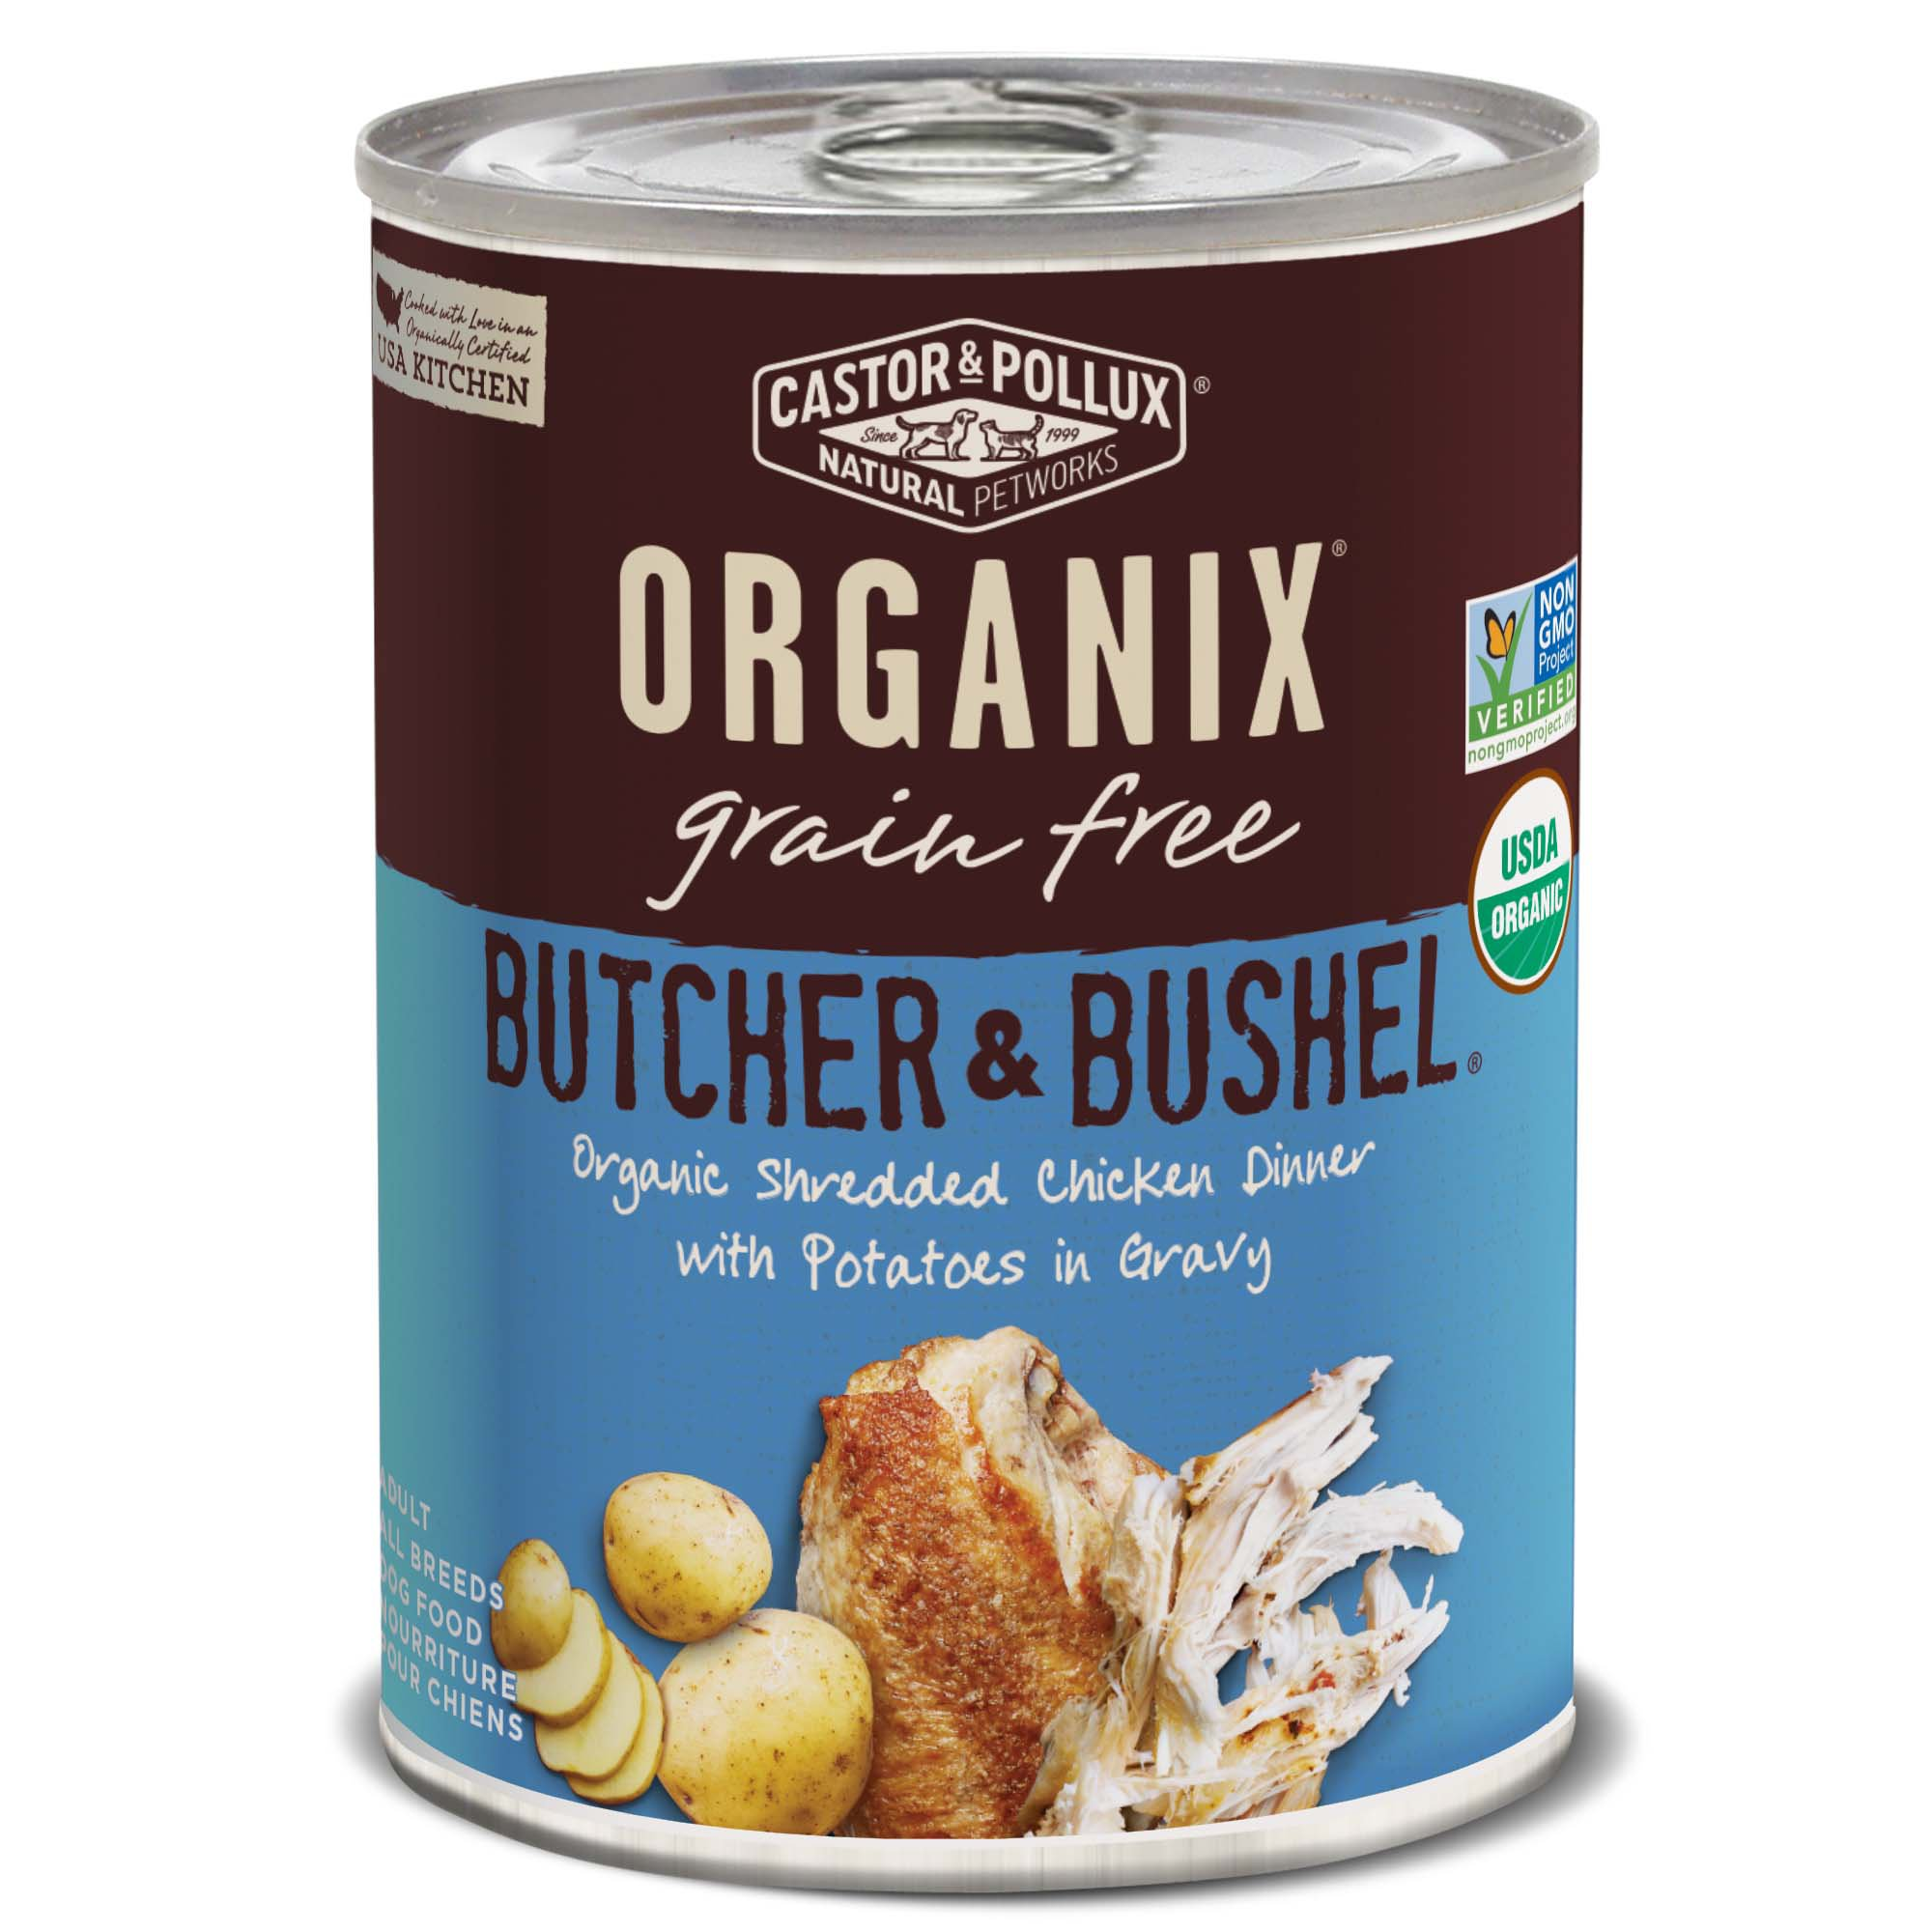 Castor & Pollux Organix Butcher & Bushel Organic Tender Chicken ...